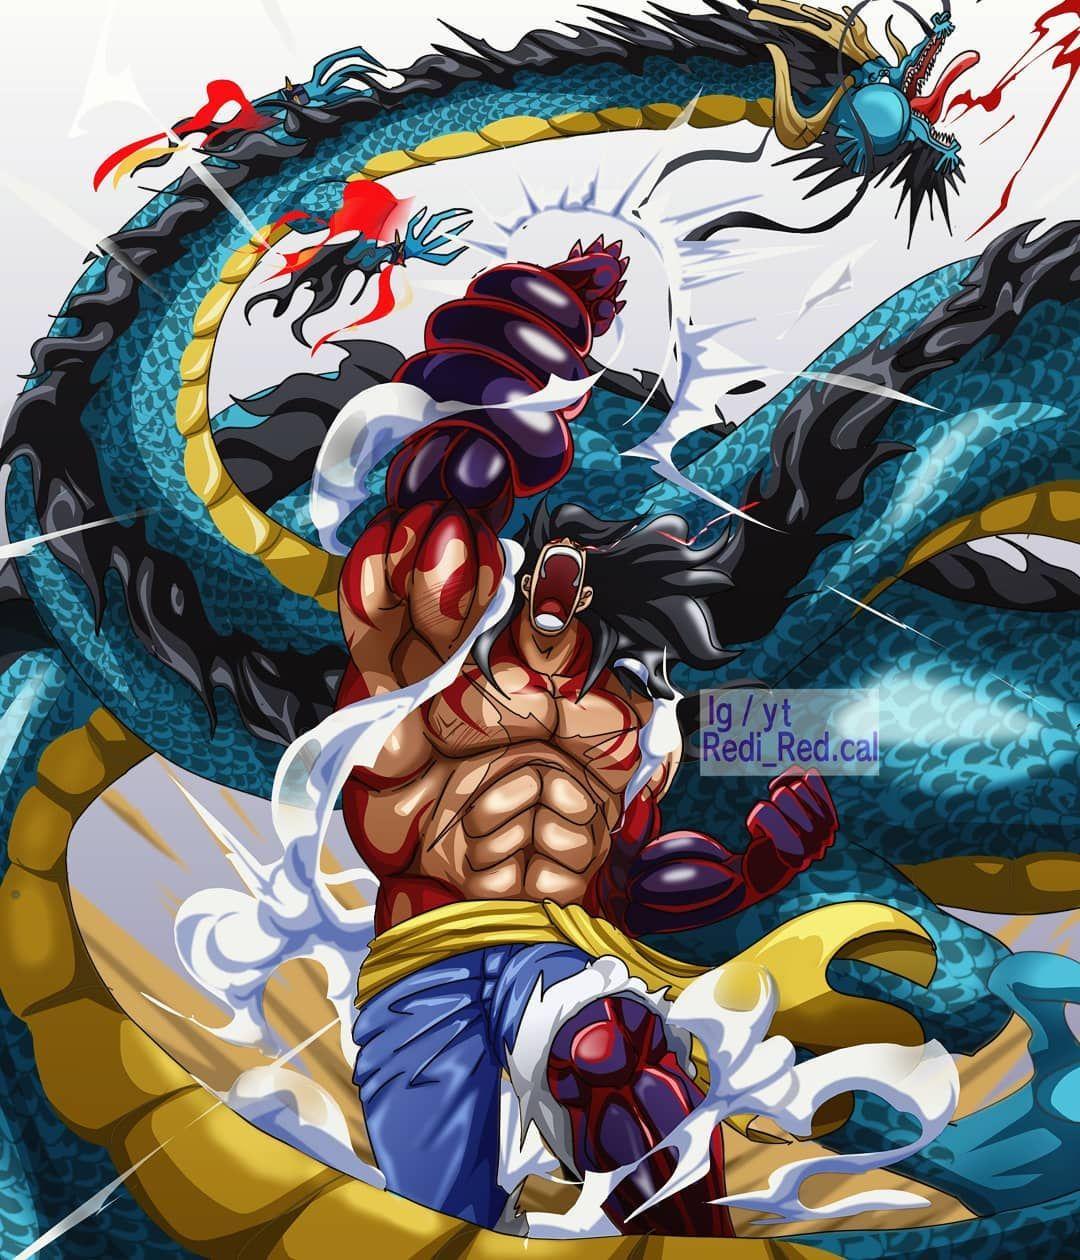 Luffy segera menyerang kaido dengan gear 4: One Piece Wallpaper One Piece Luffy Gear 5 Vs Kaido